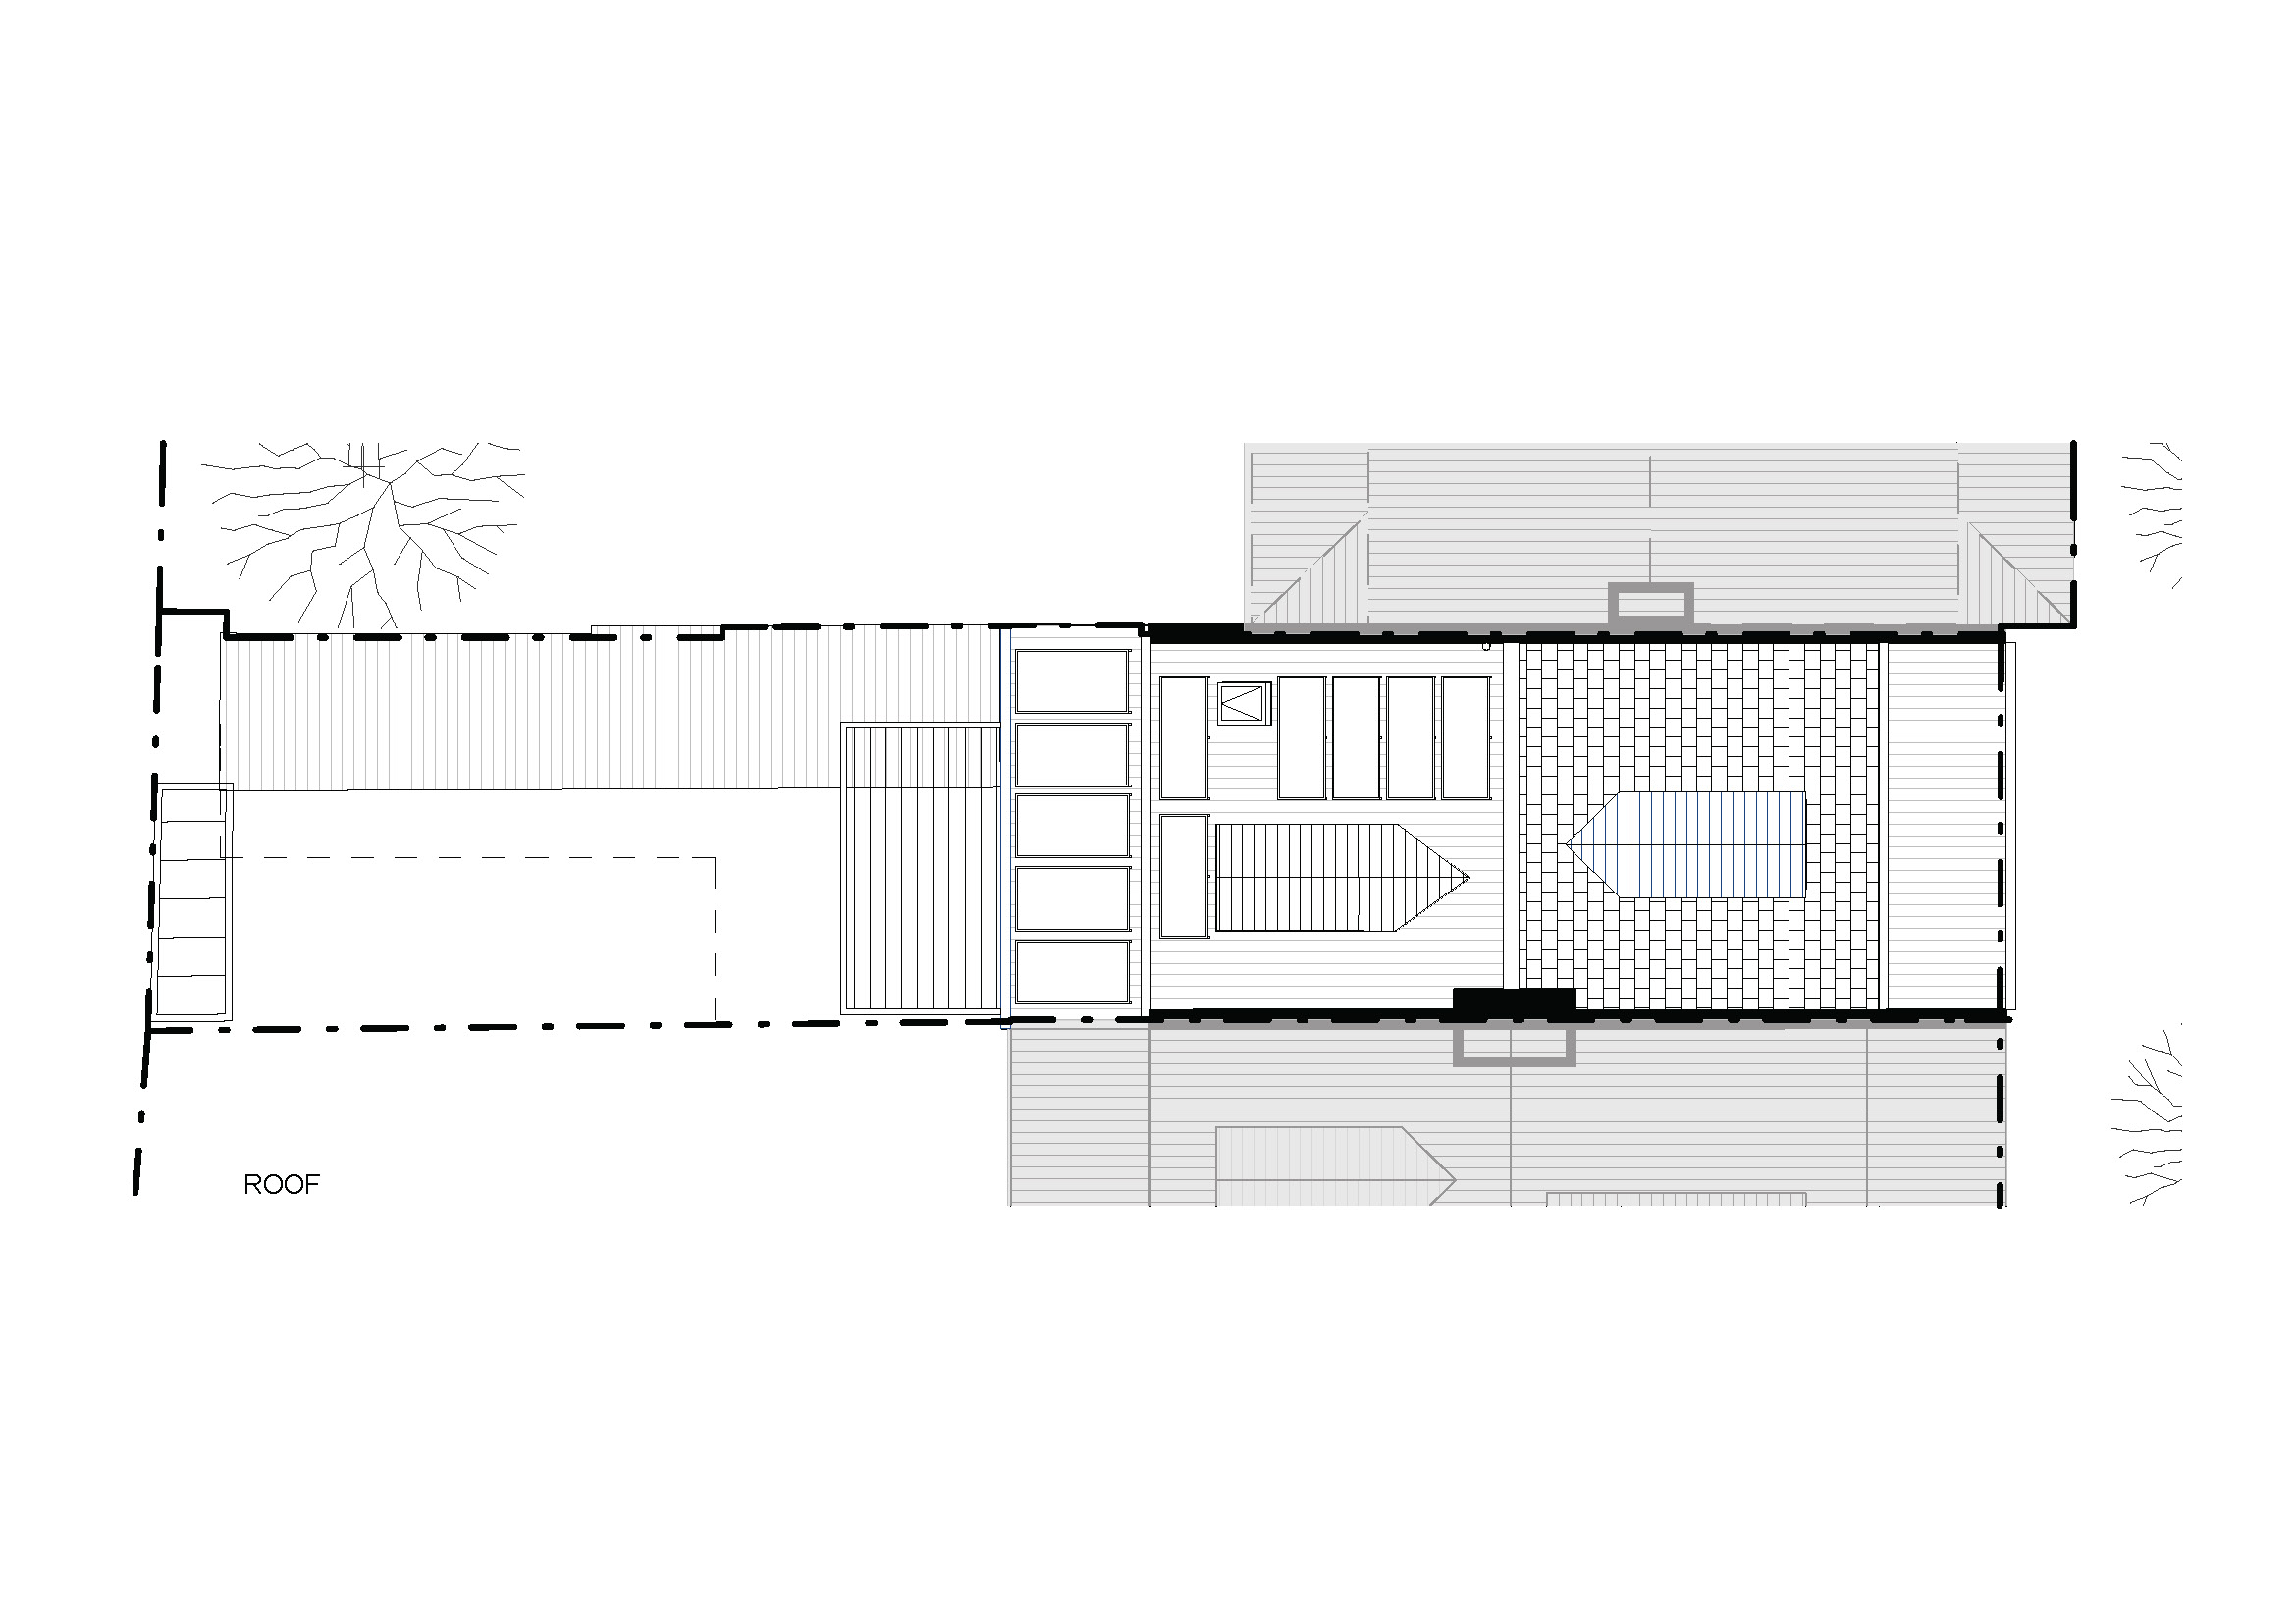 05 roof.jpg